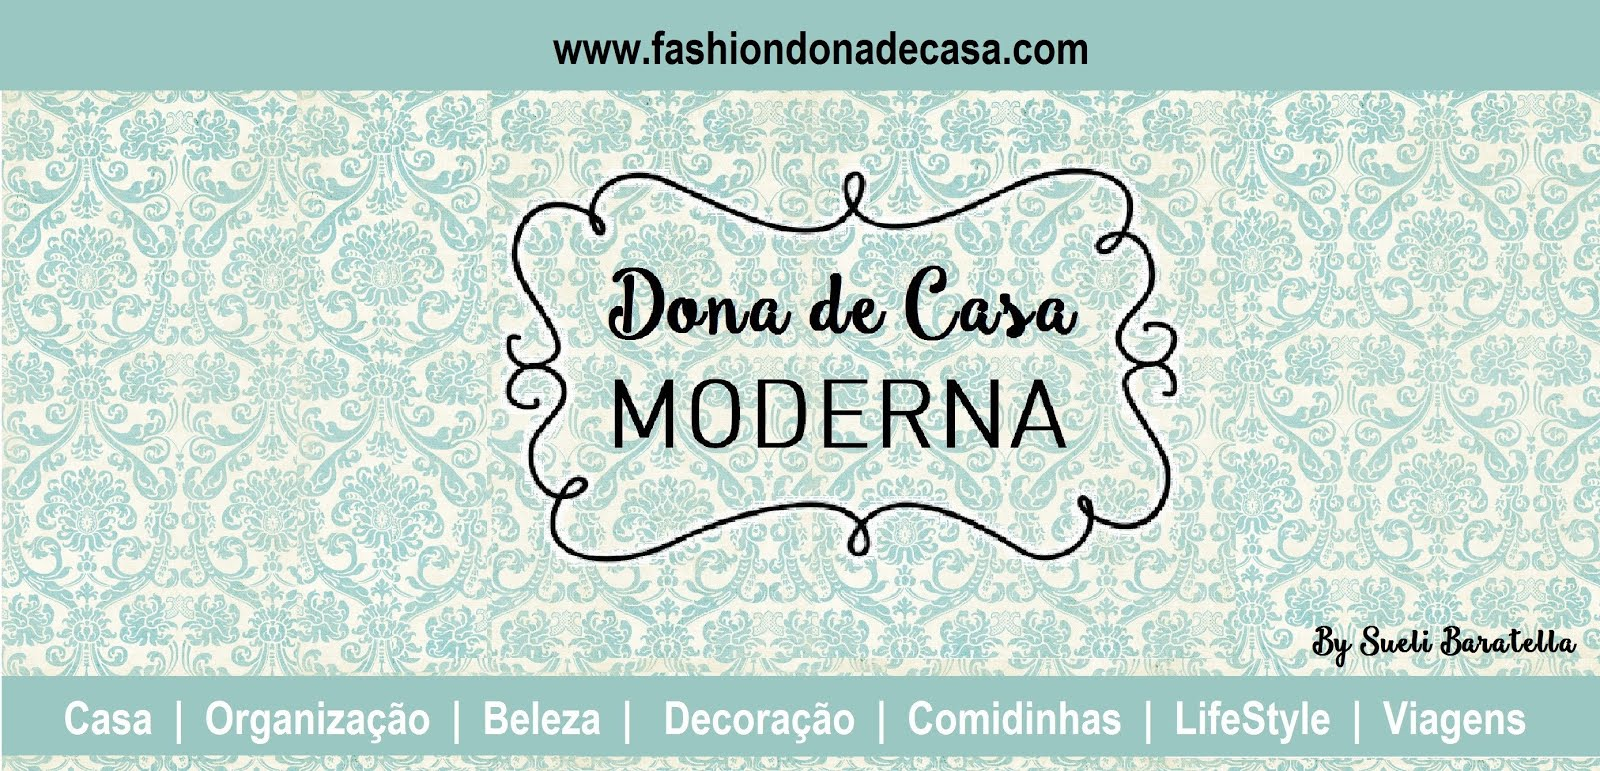 FASHION DONA DE CASA